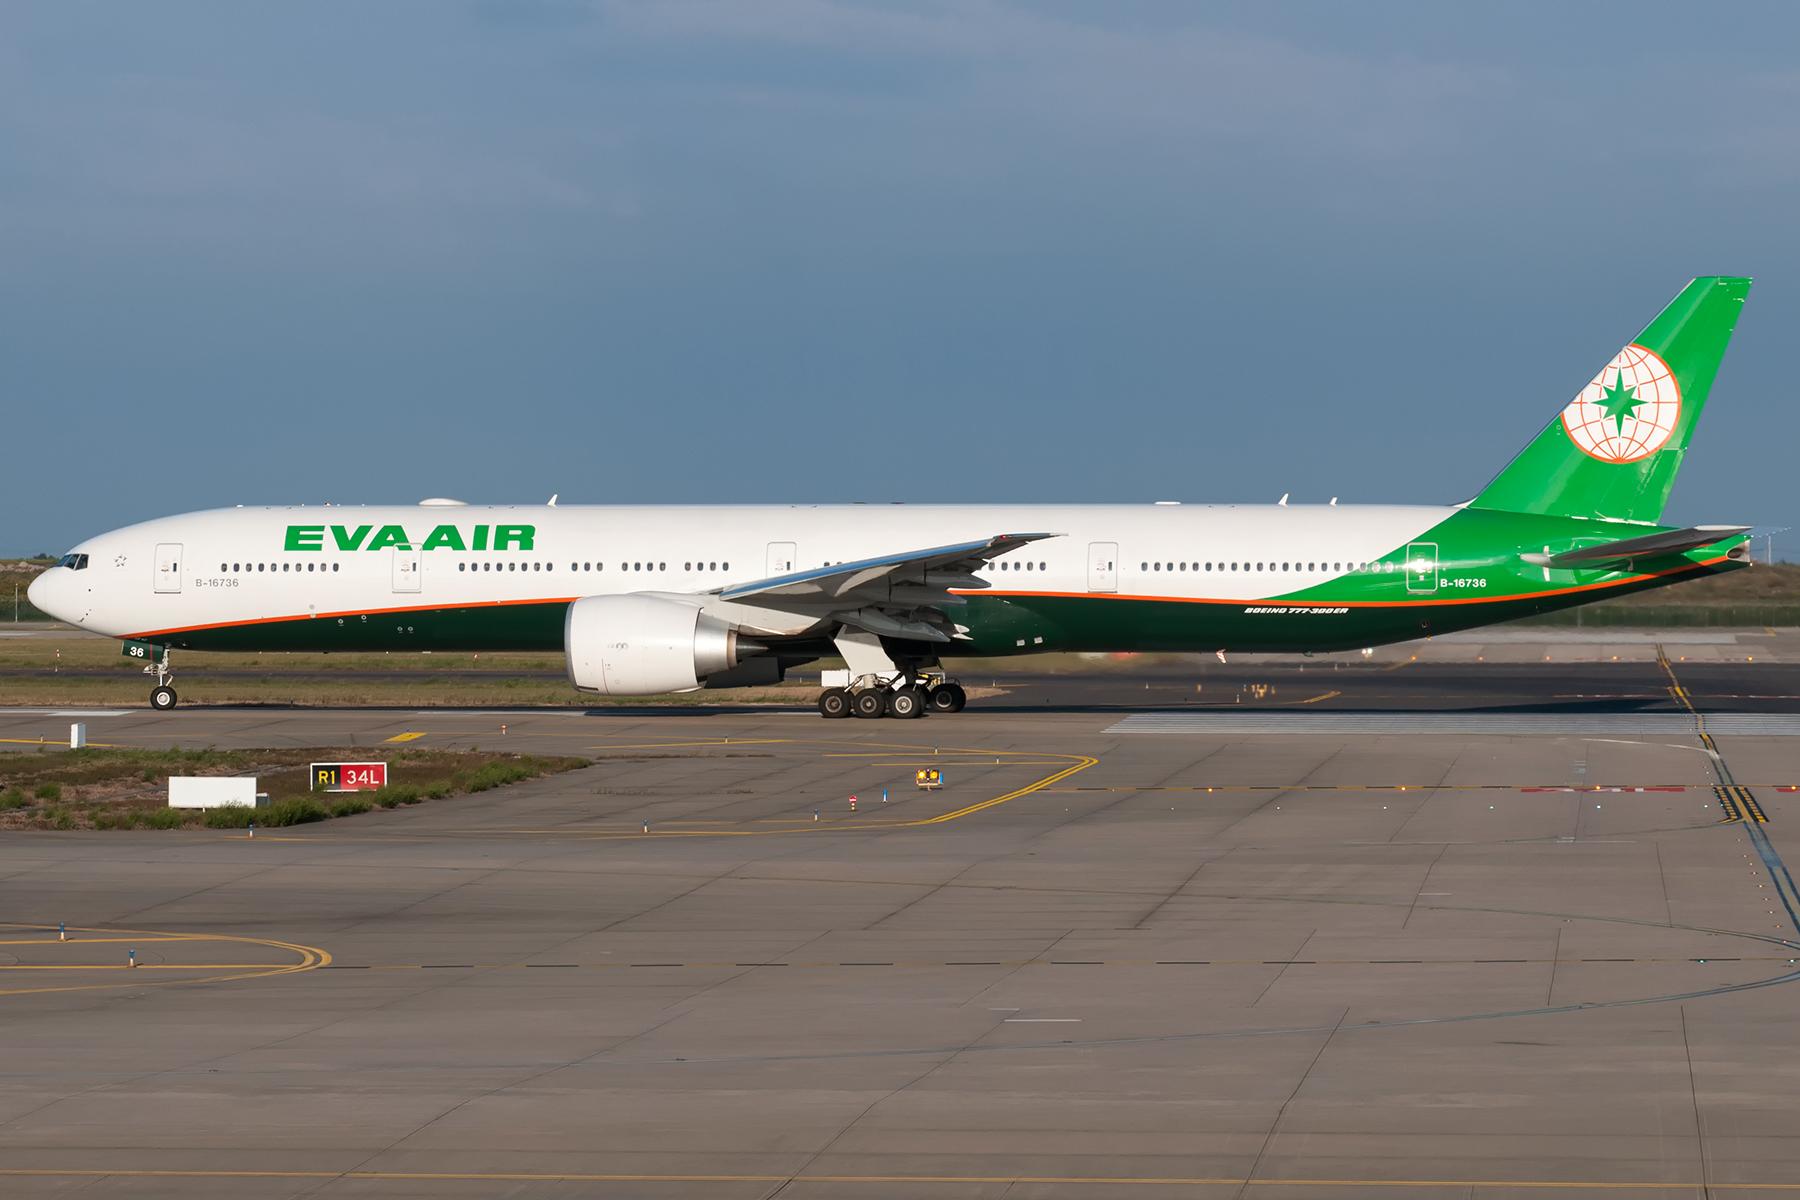 Re:[原创]EVA AIR 一对 77W BOEING 777-300ER B-16736 中国上海浦东国际机场